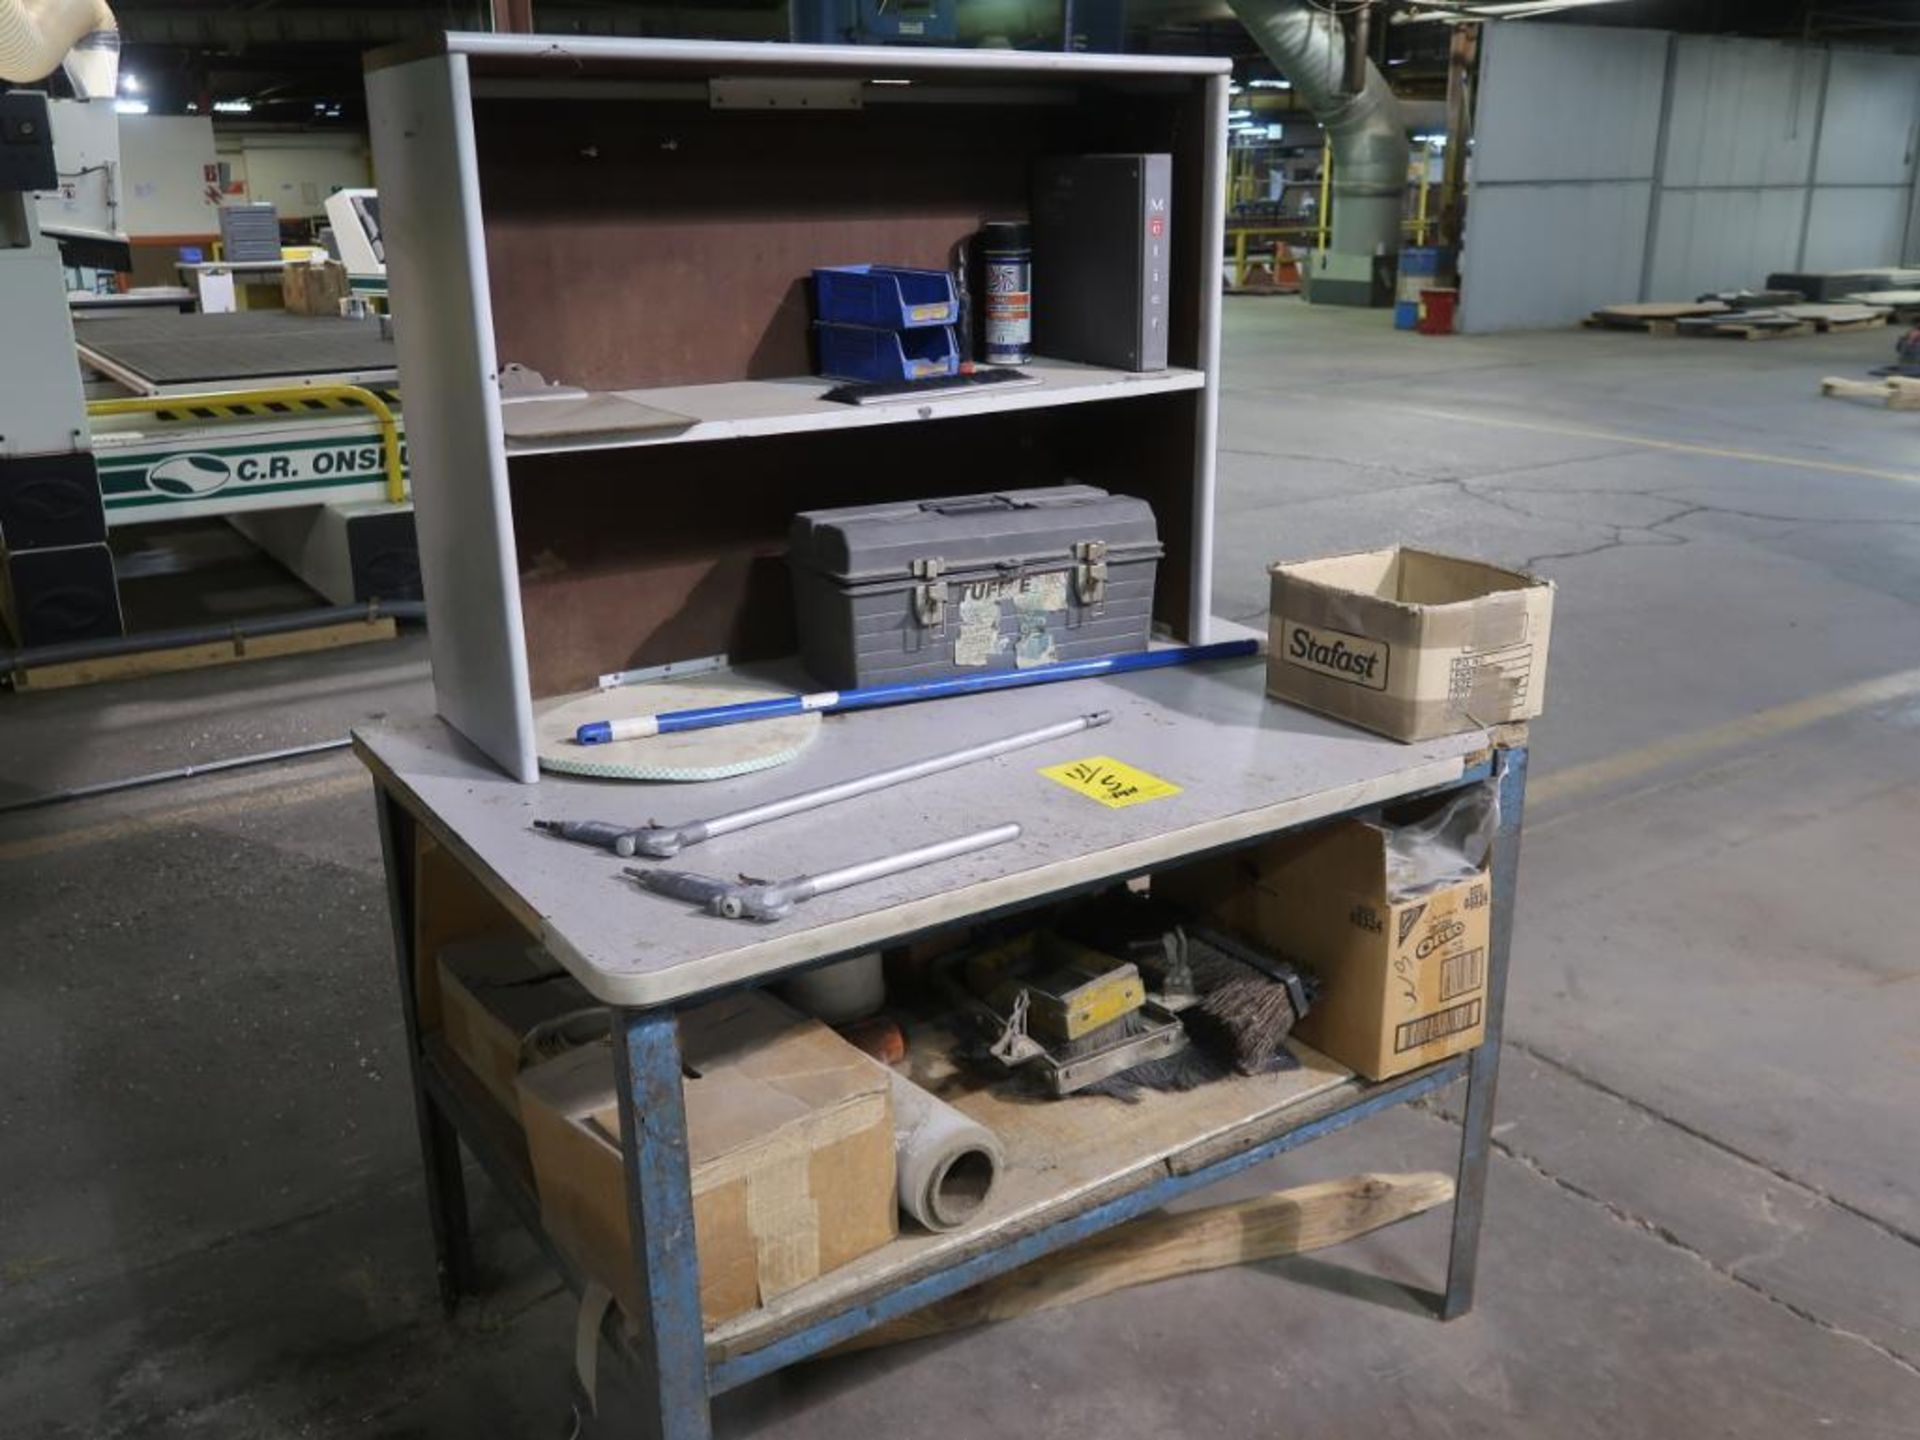 Lot 5 - Wadkin 4-Head CNC Router Model UX, S/N VX/F/LC91559, 52 in. x 108 in. Vacuum Table, 7.5 HP Twin